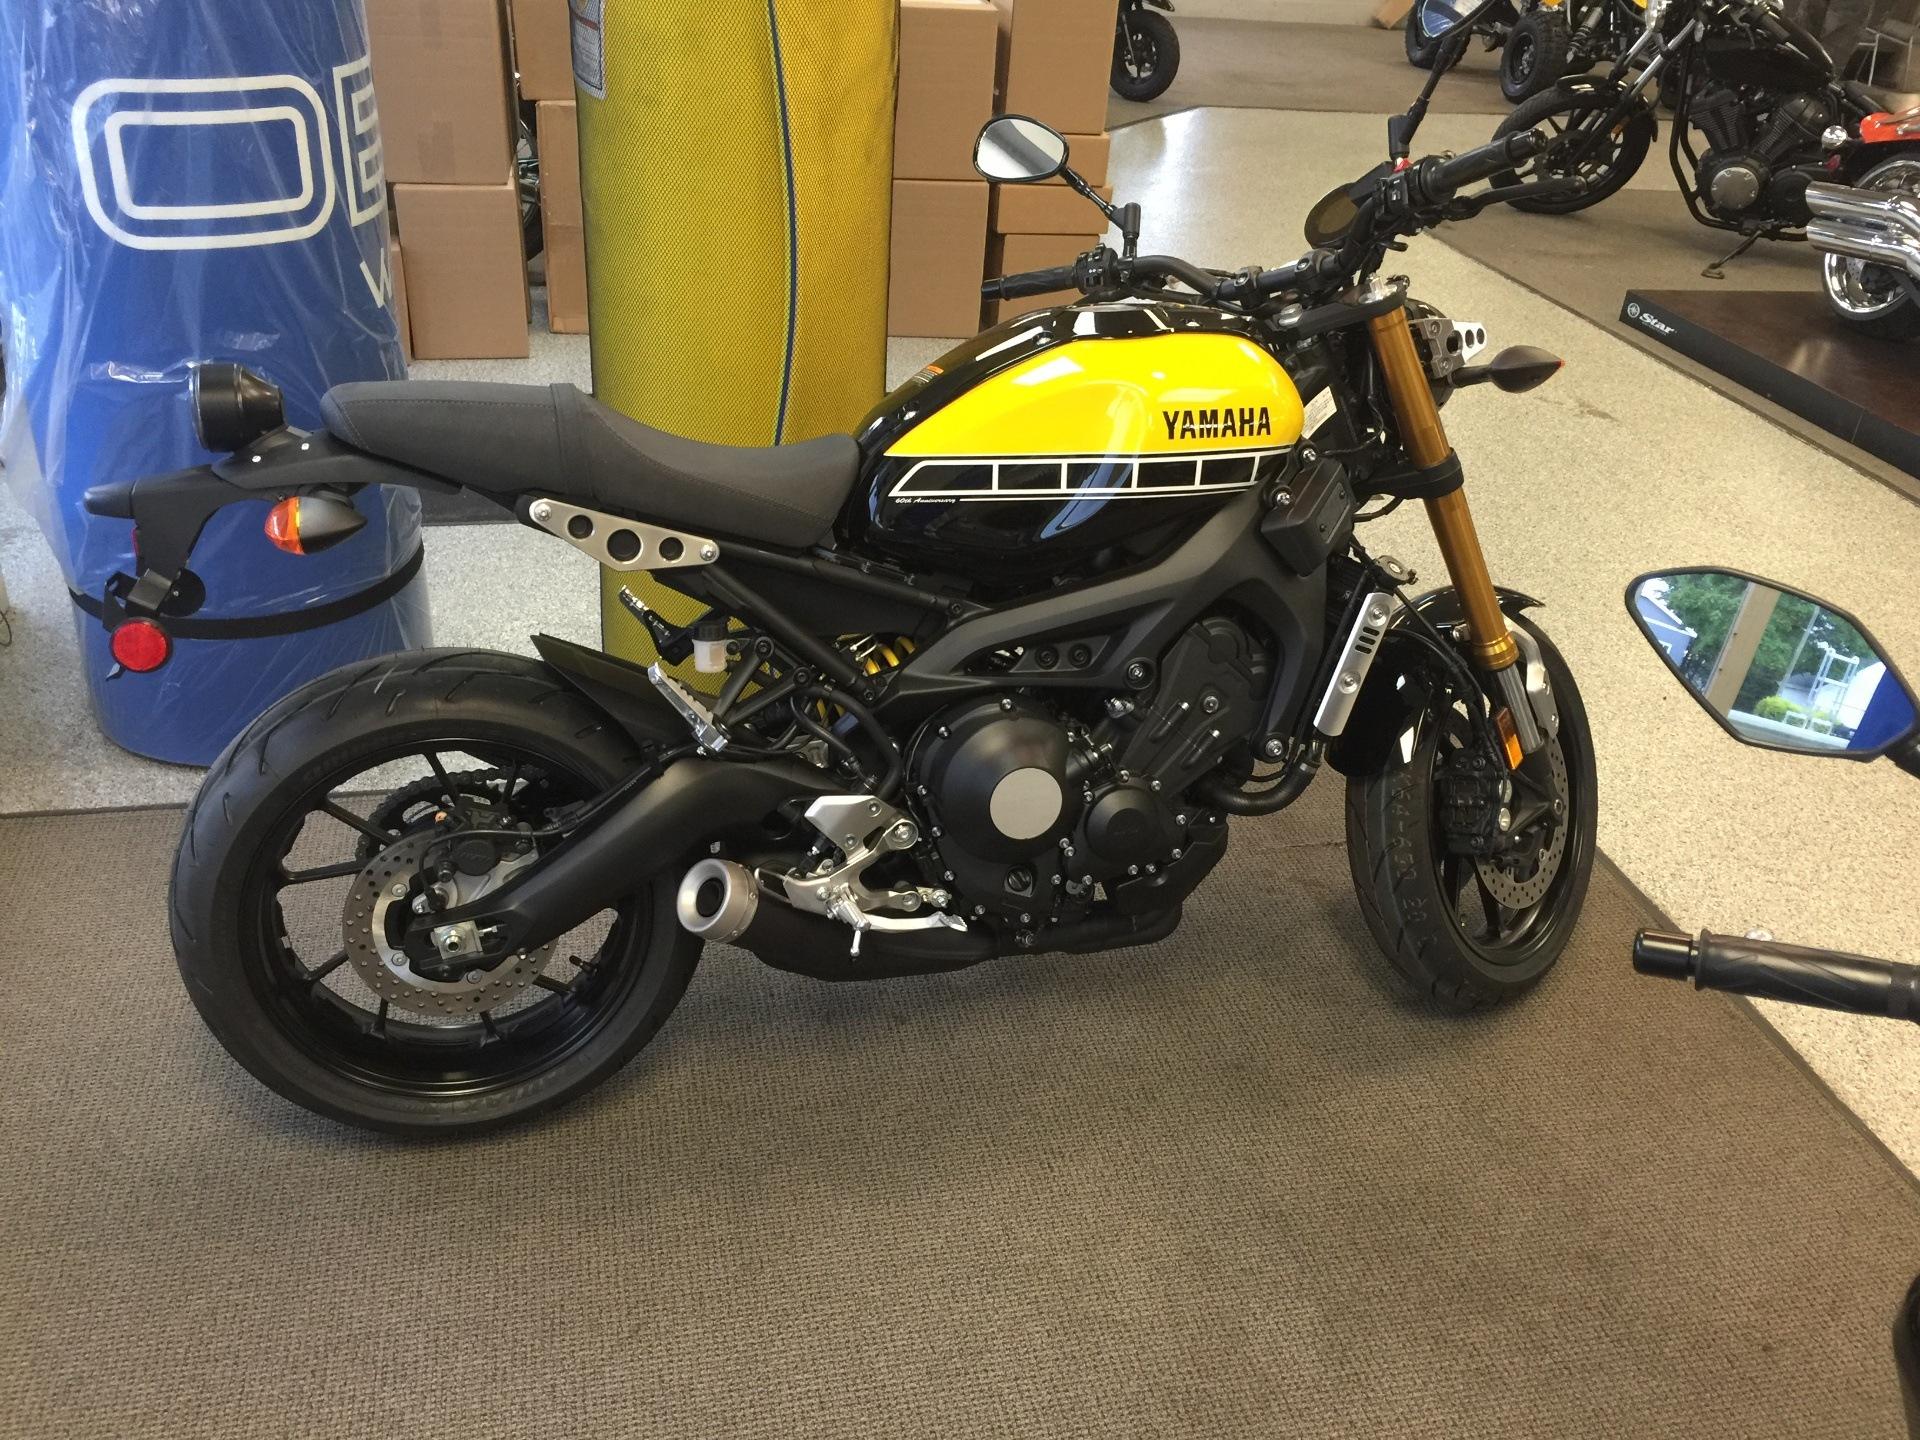 2016 Yamaha XSR900 for sale 120054